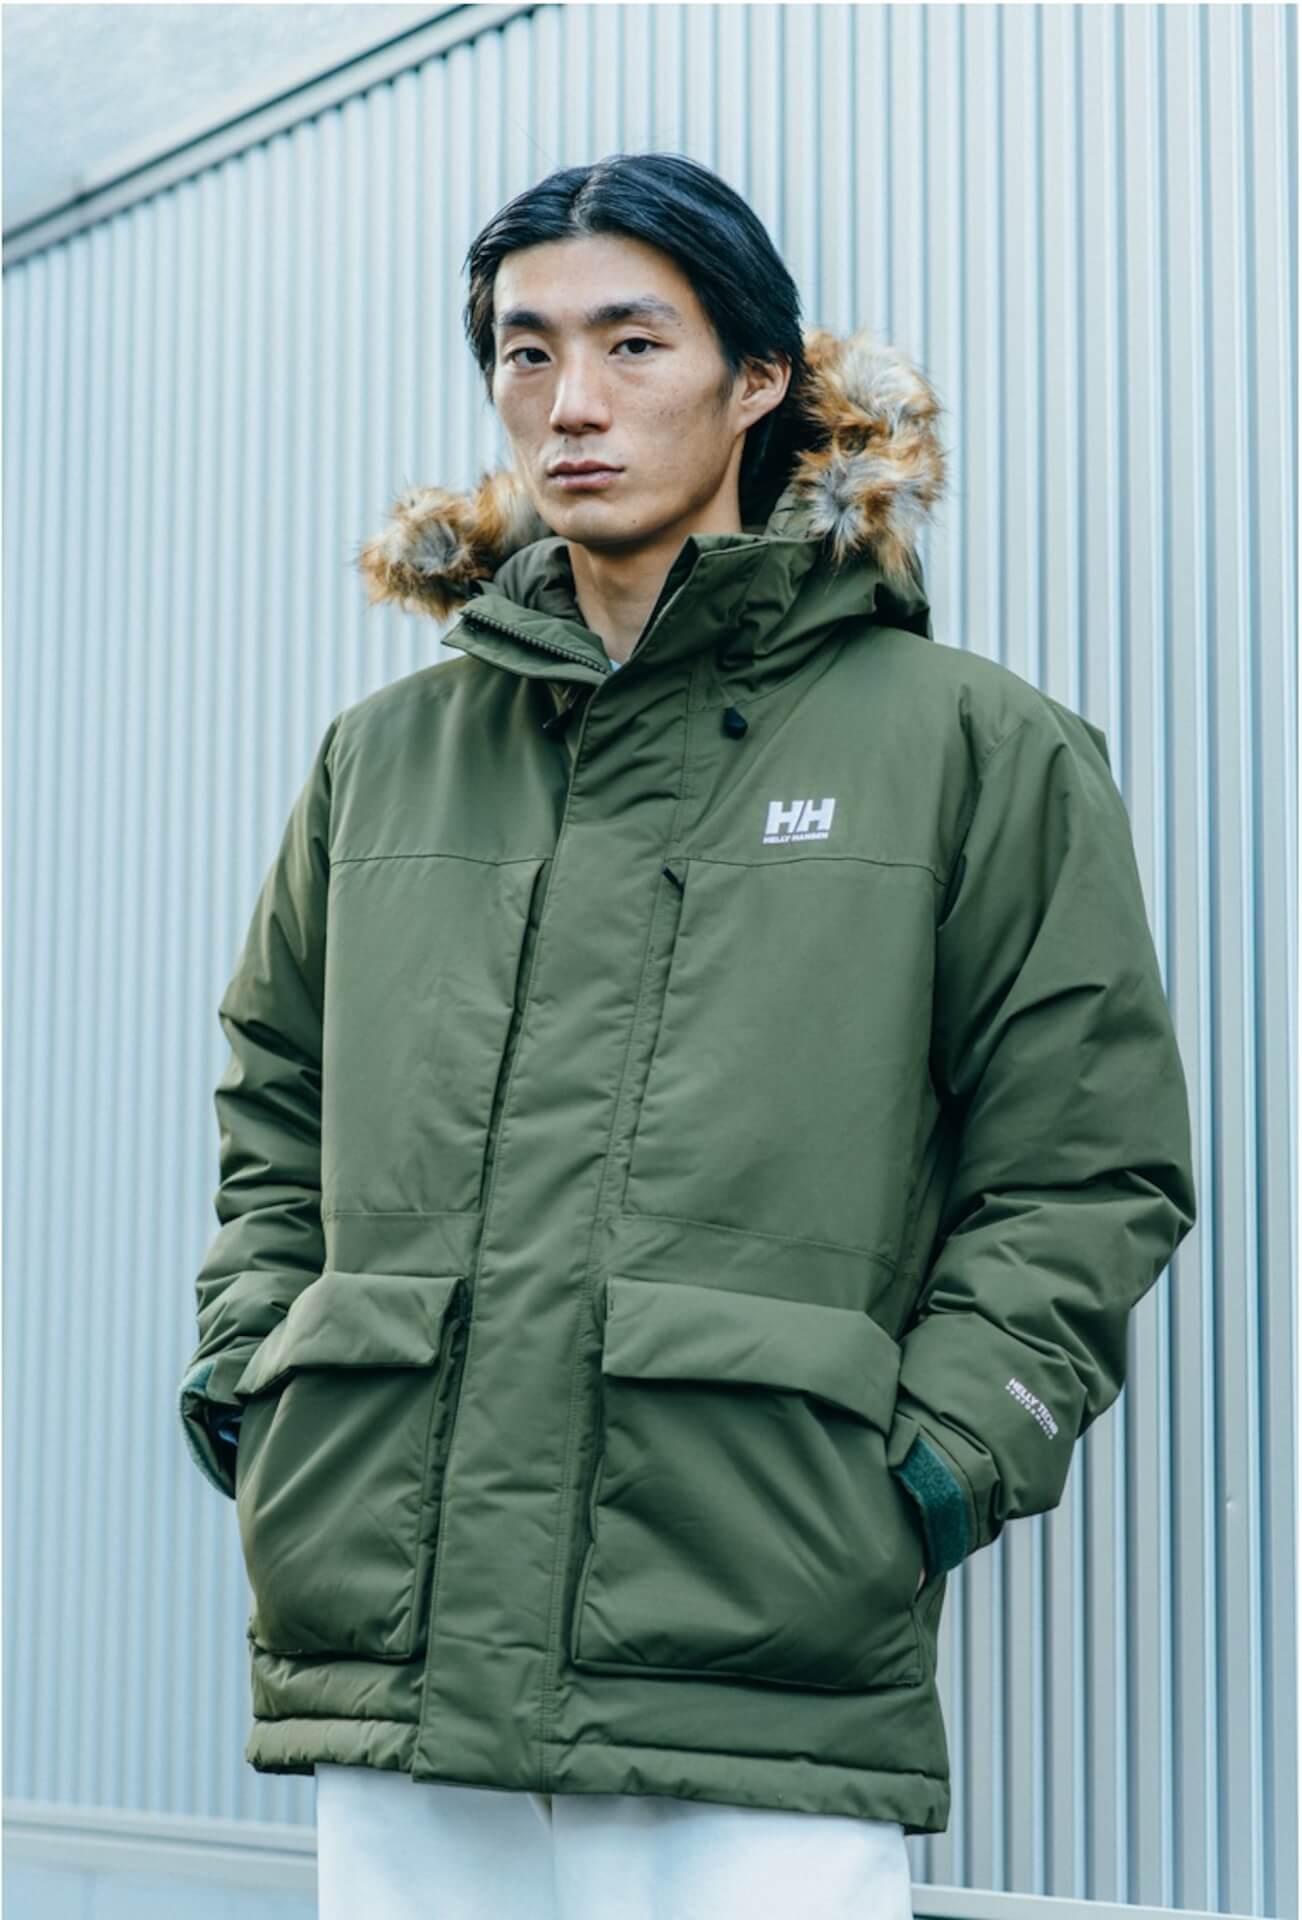 HELLY HANSENから防水透湿性を兼ね備えたハイロフトダウン『Hemsedal Jacket』&『Mager Insulation Jacket』が登場! fashion201215_hellyhansen_down_4